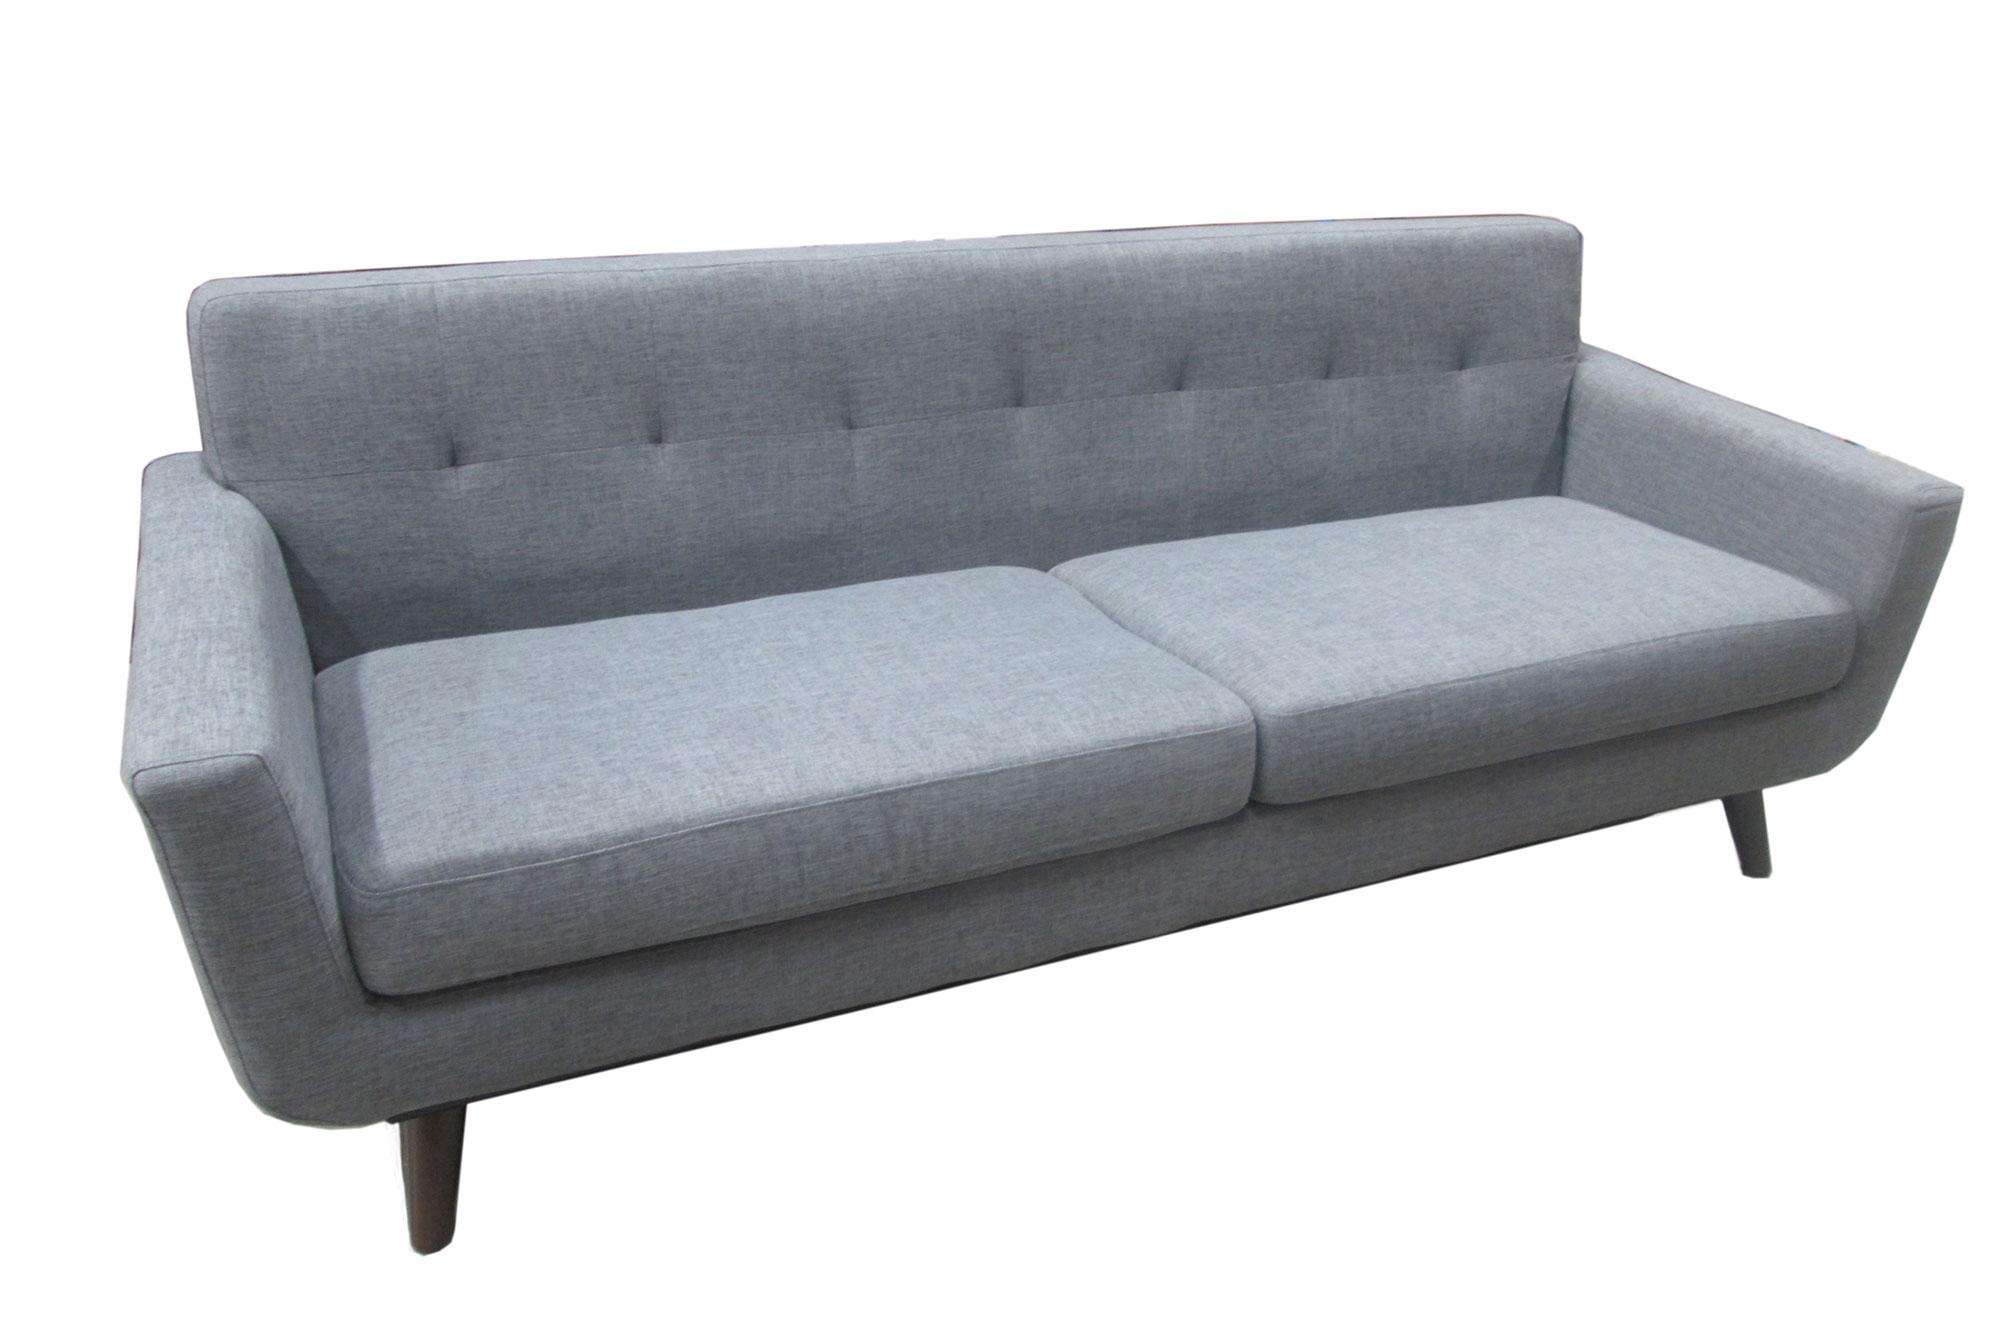 Furniture Iso Mid Century Milo Sofa Grey – Metroconnections Pertaining To Milo Sofa Chairs (Image 9 of 25)